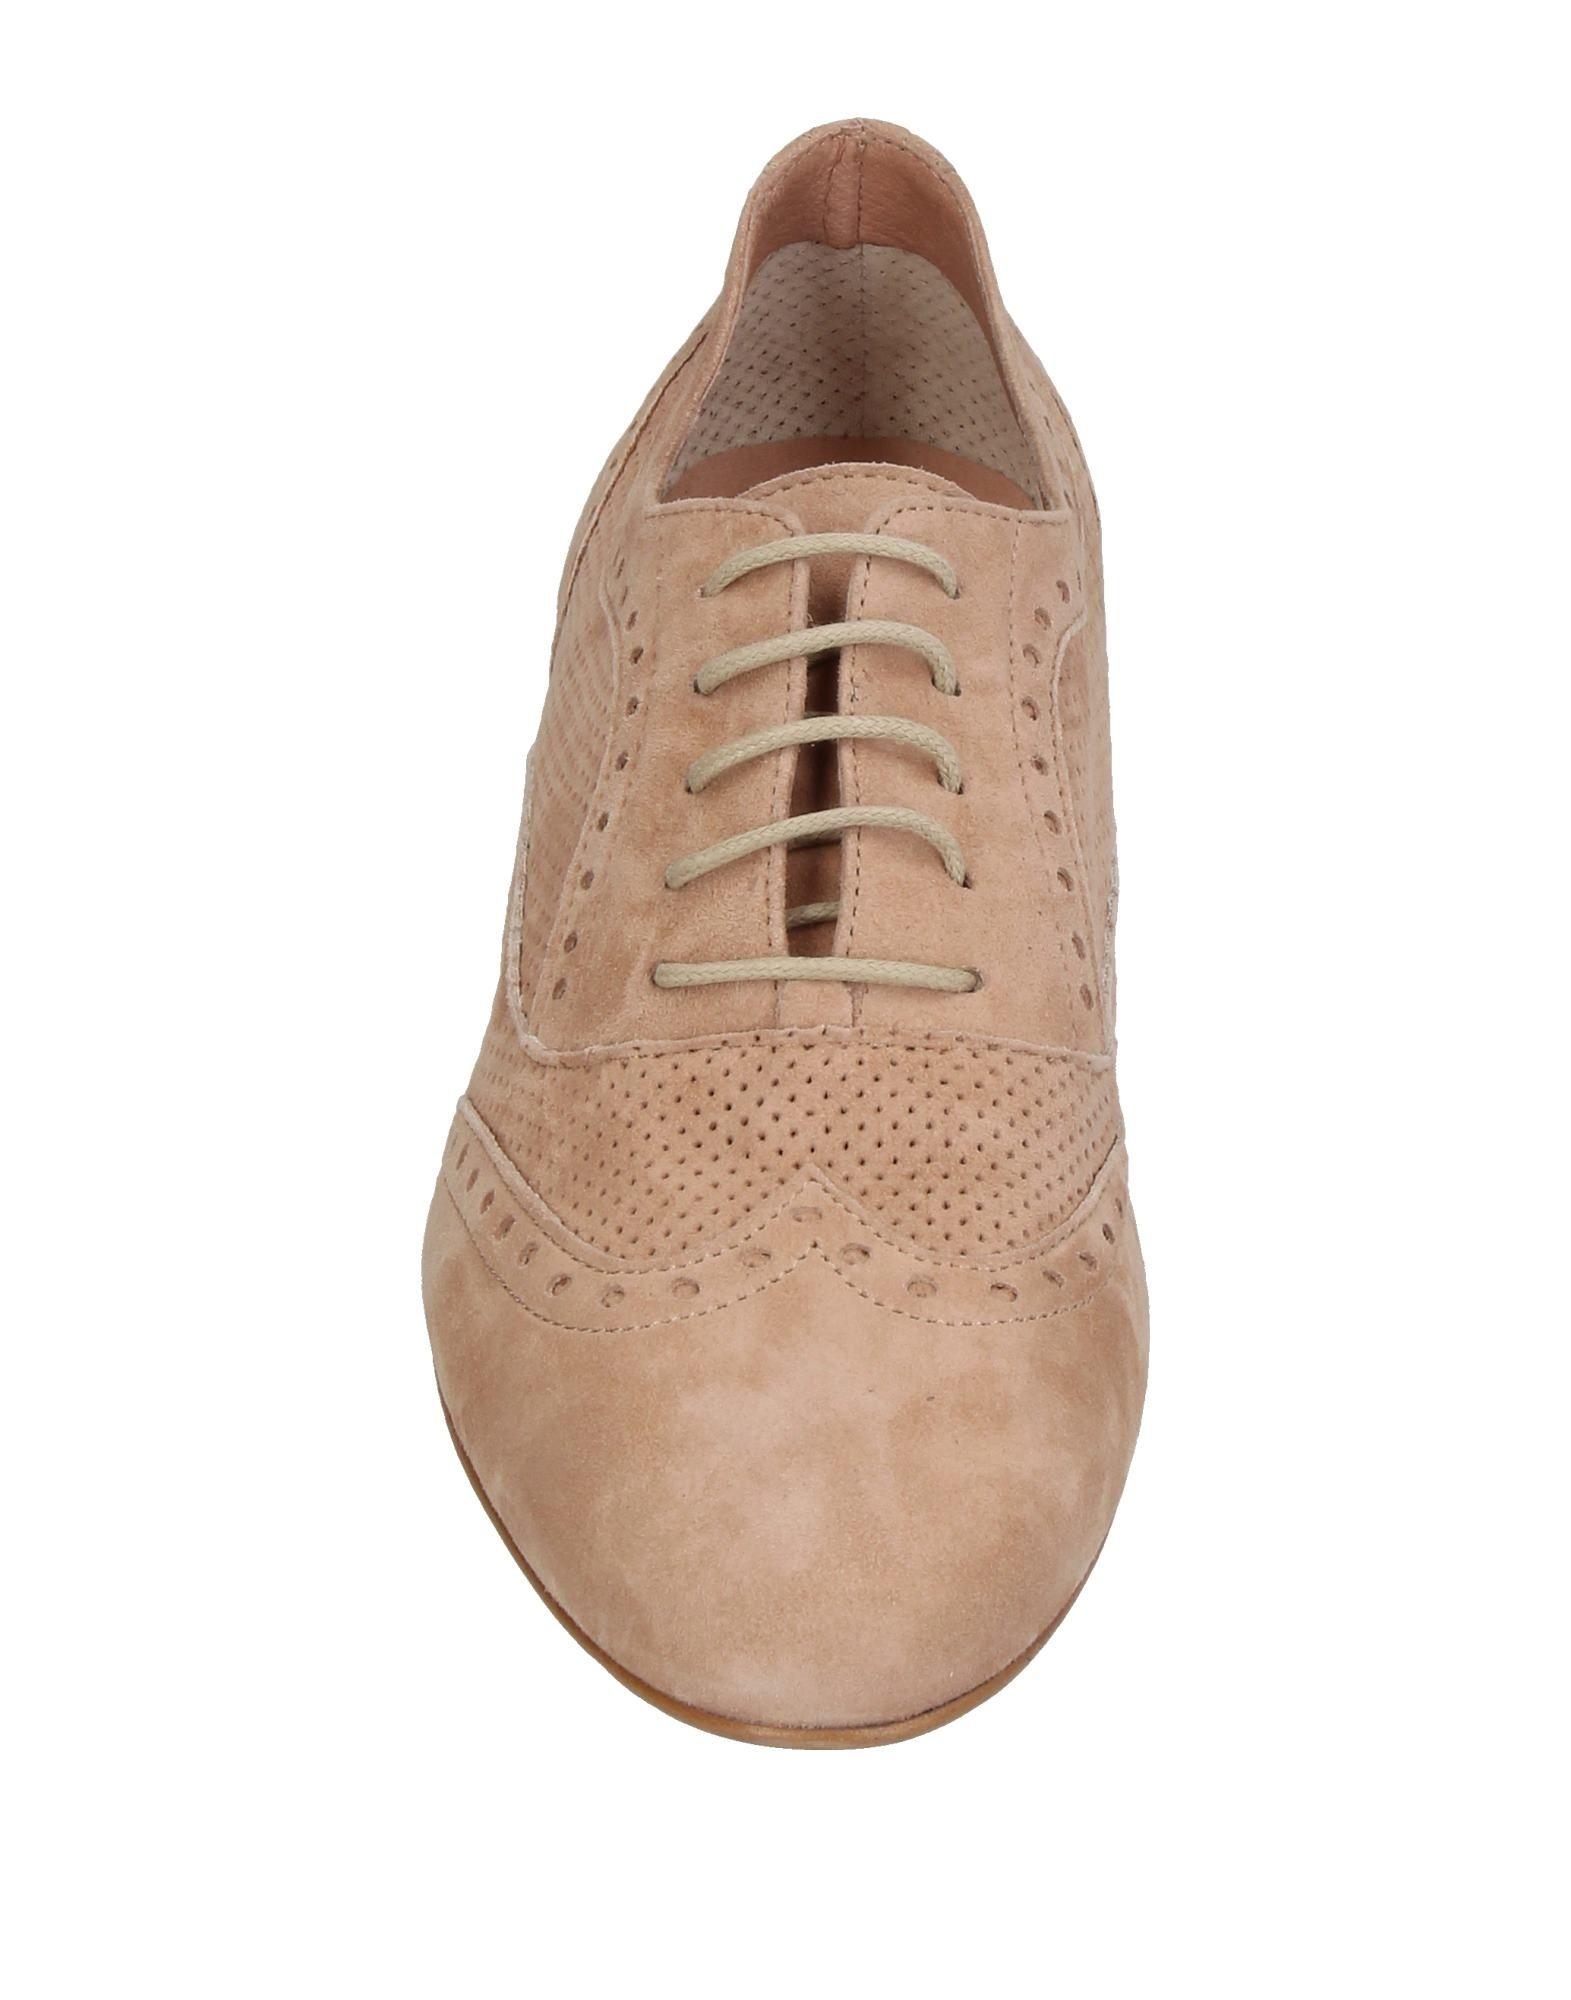 Chaussures À Lacets Mally Femme - Chaussures À Lacets Mally sur